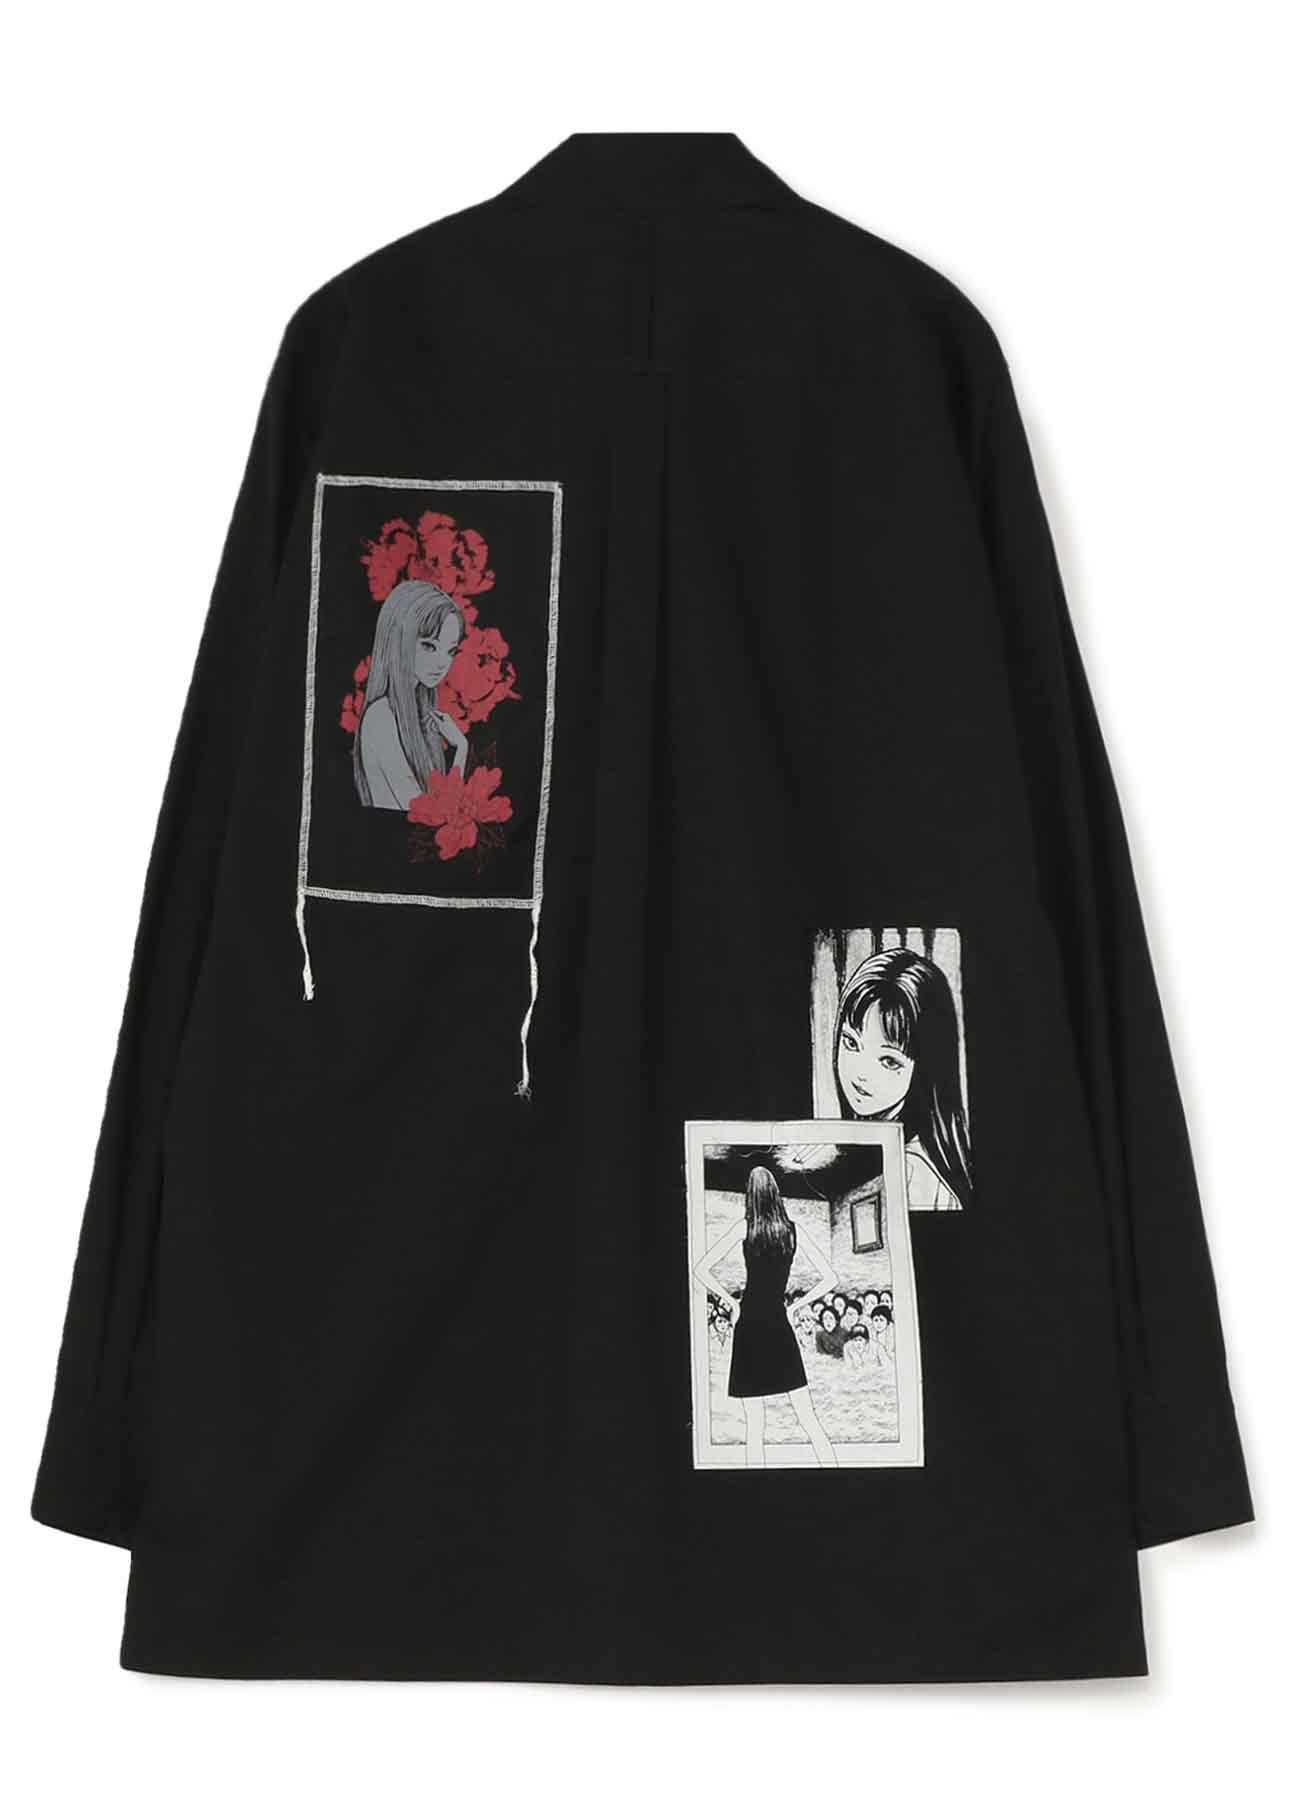 100/2 Broad Junji Ito「Tomie」Omnibus Printed Patch Shirt